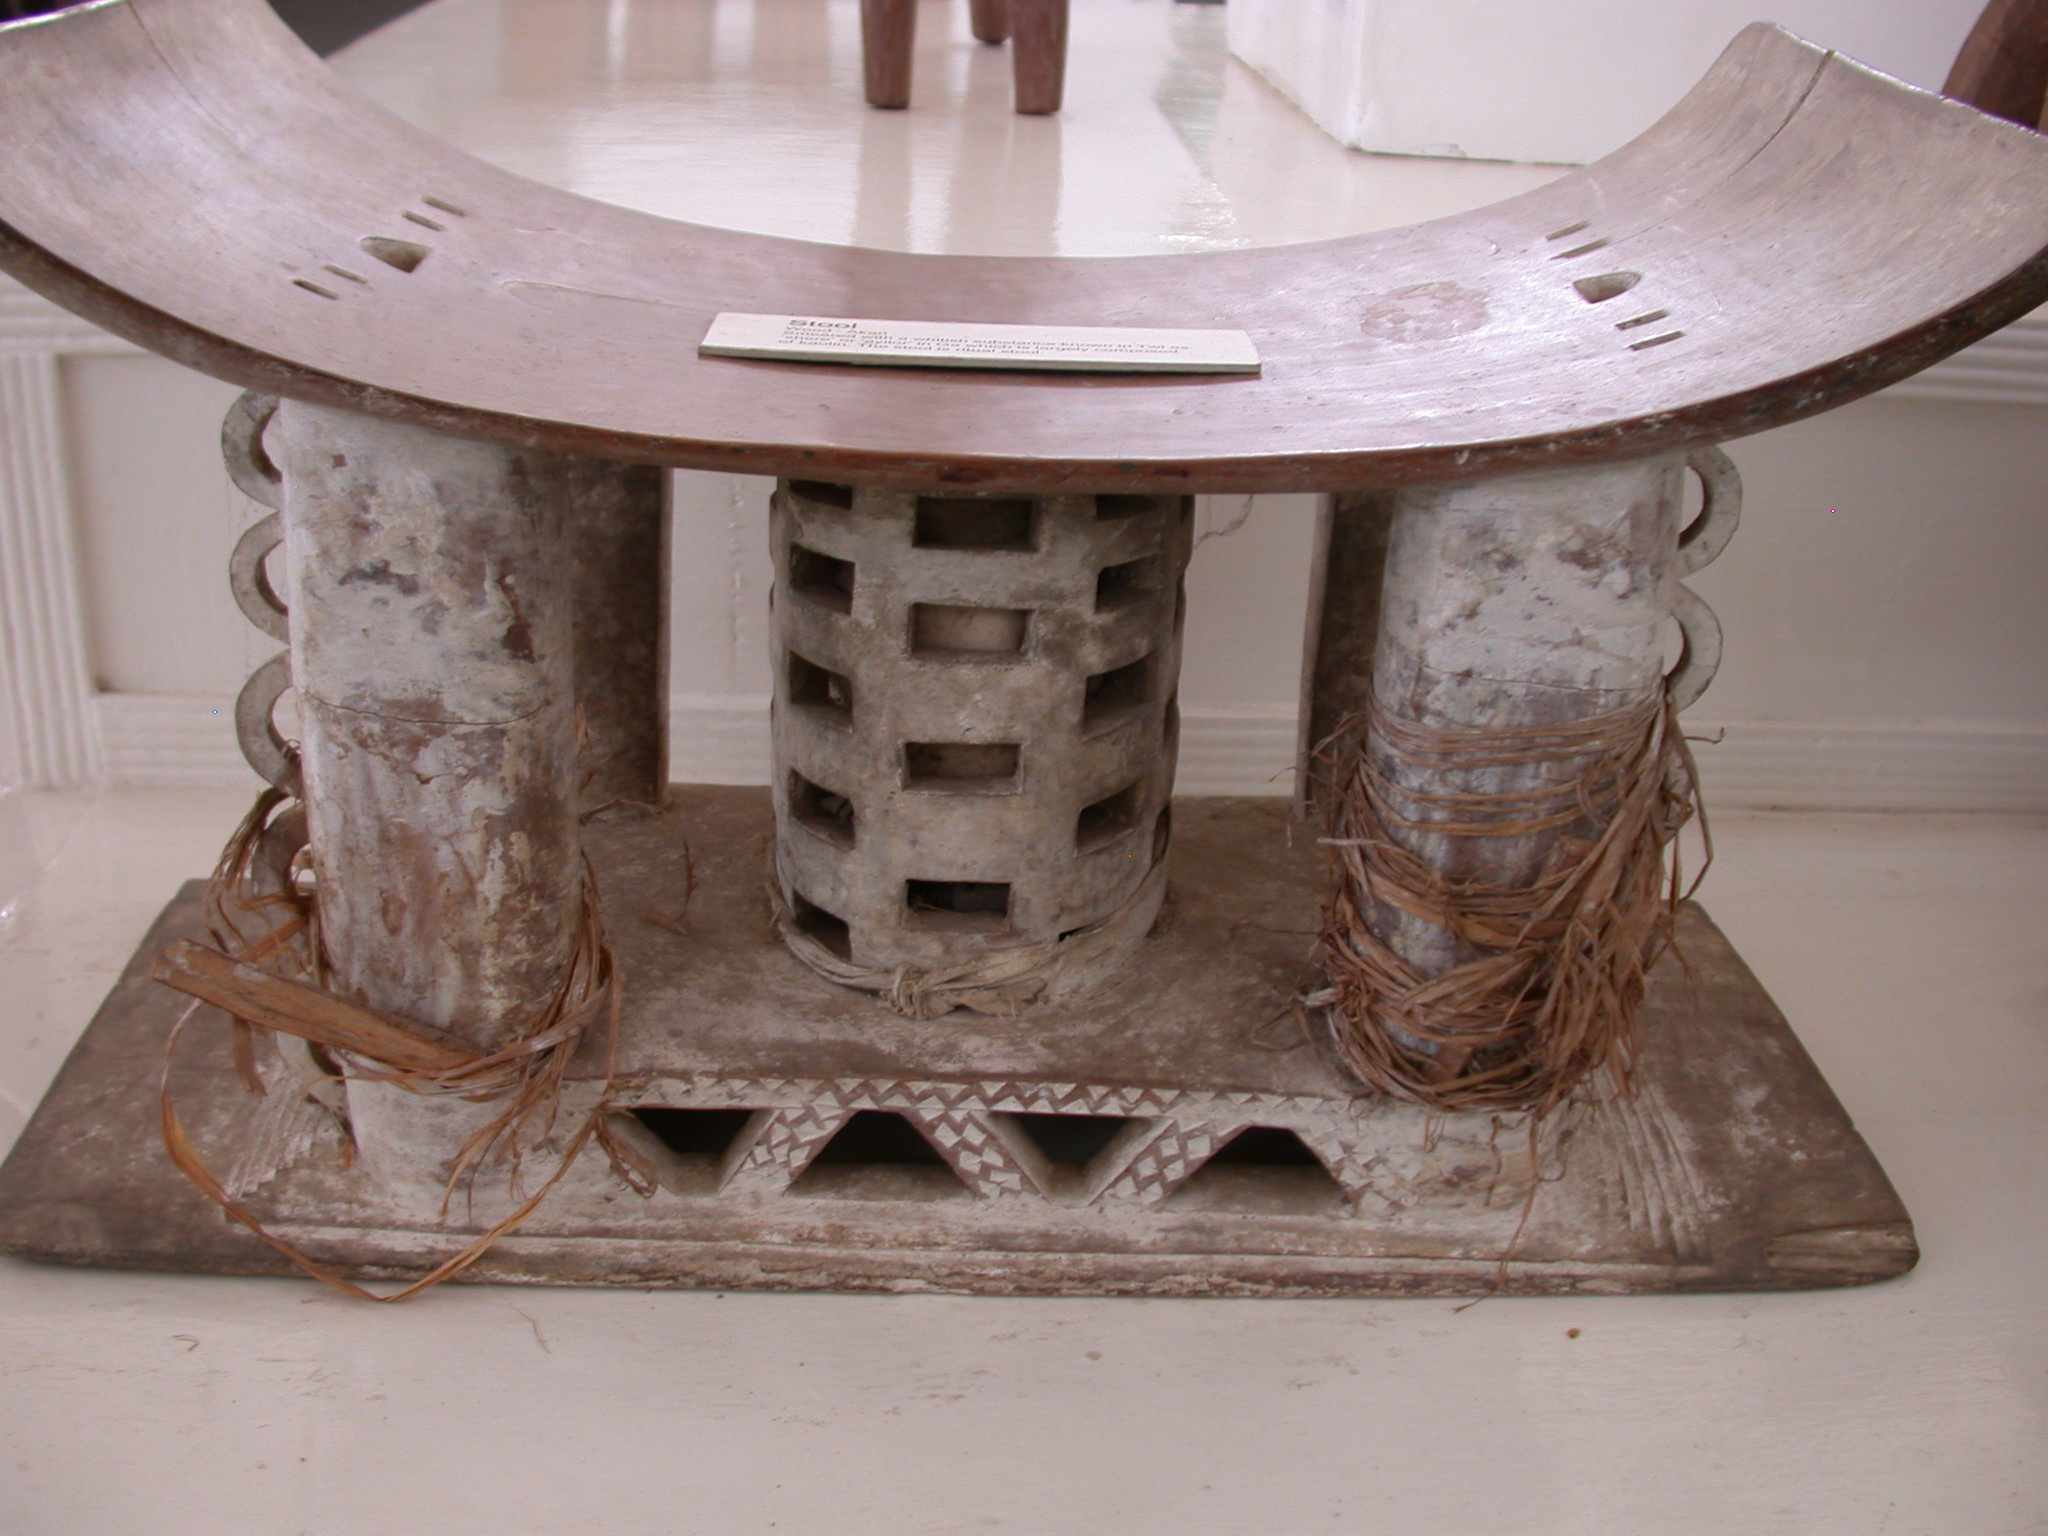 Ritual Stool, National Museum, Accra, Ghana